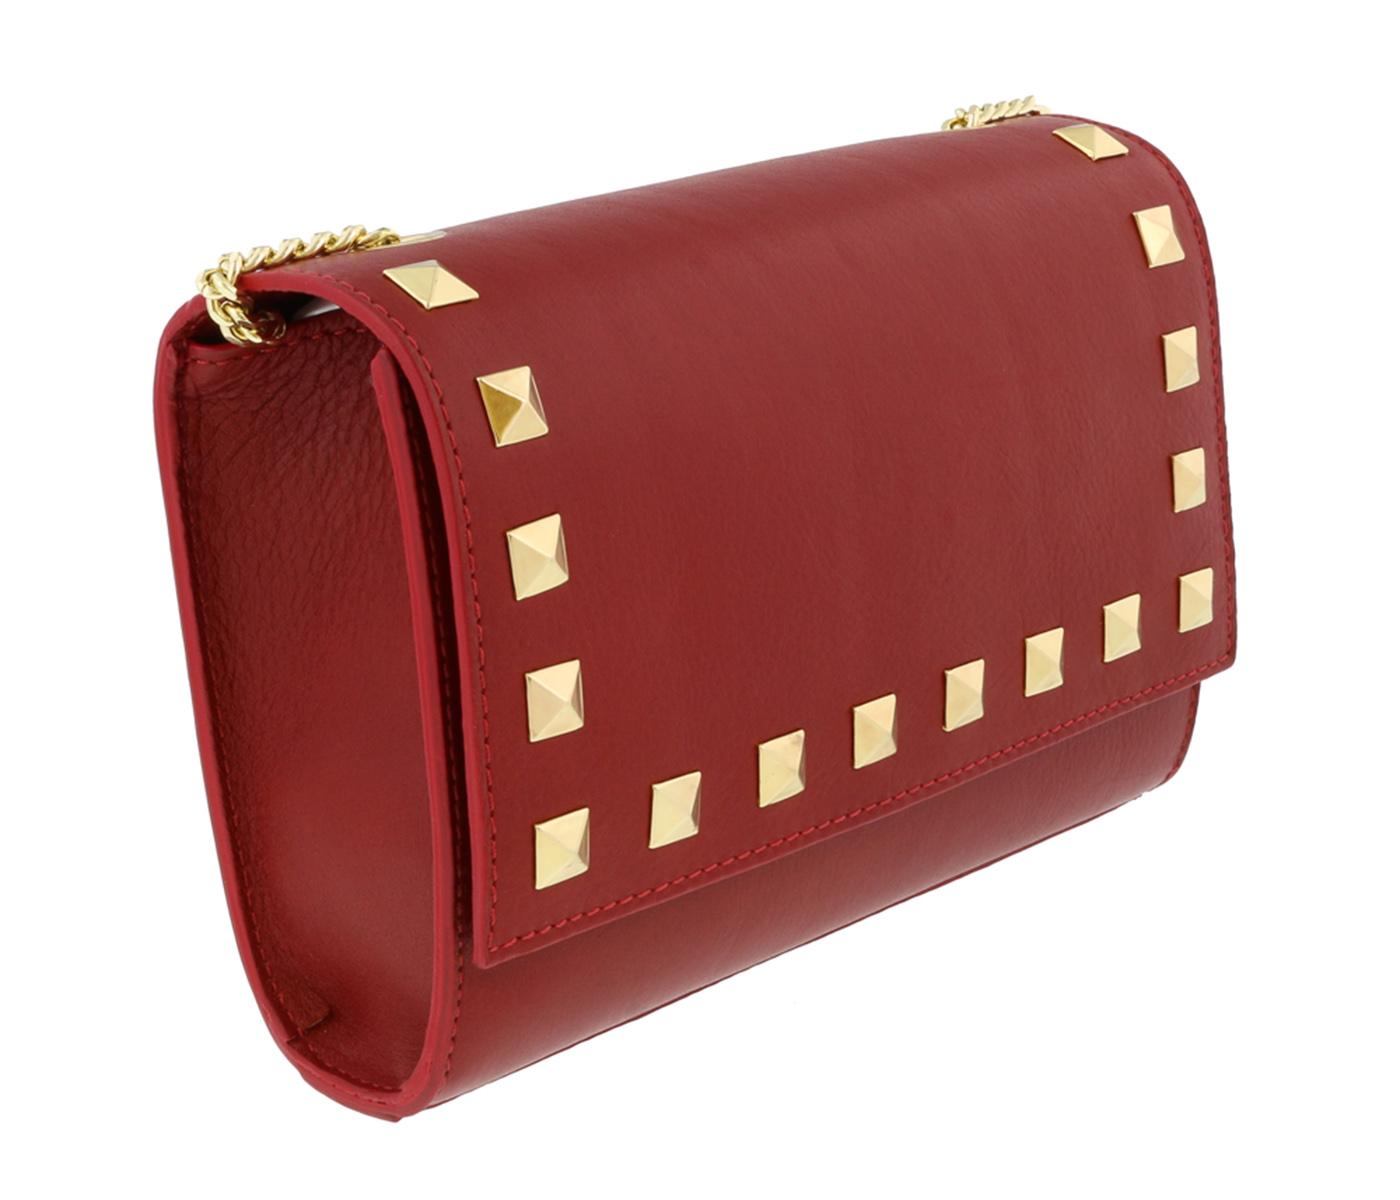 Scheilan Cherry Red Leather Studded Flap  Shoulder Bag